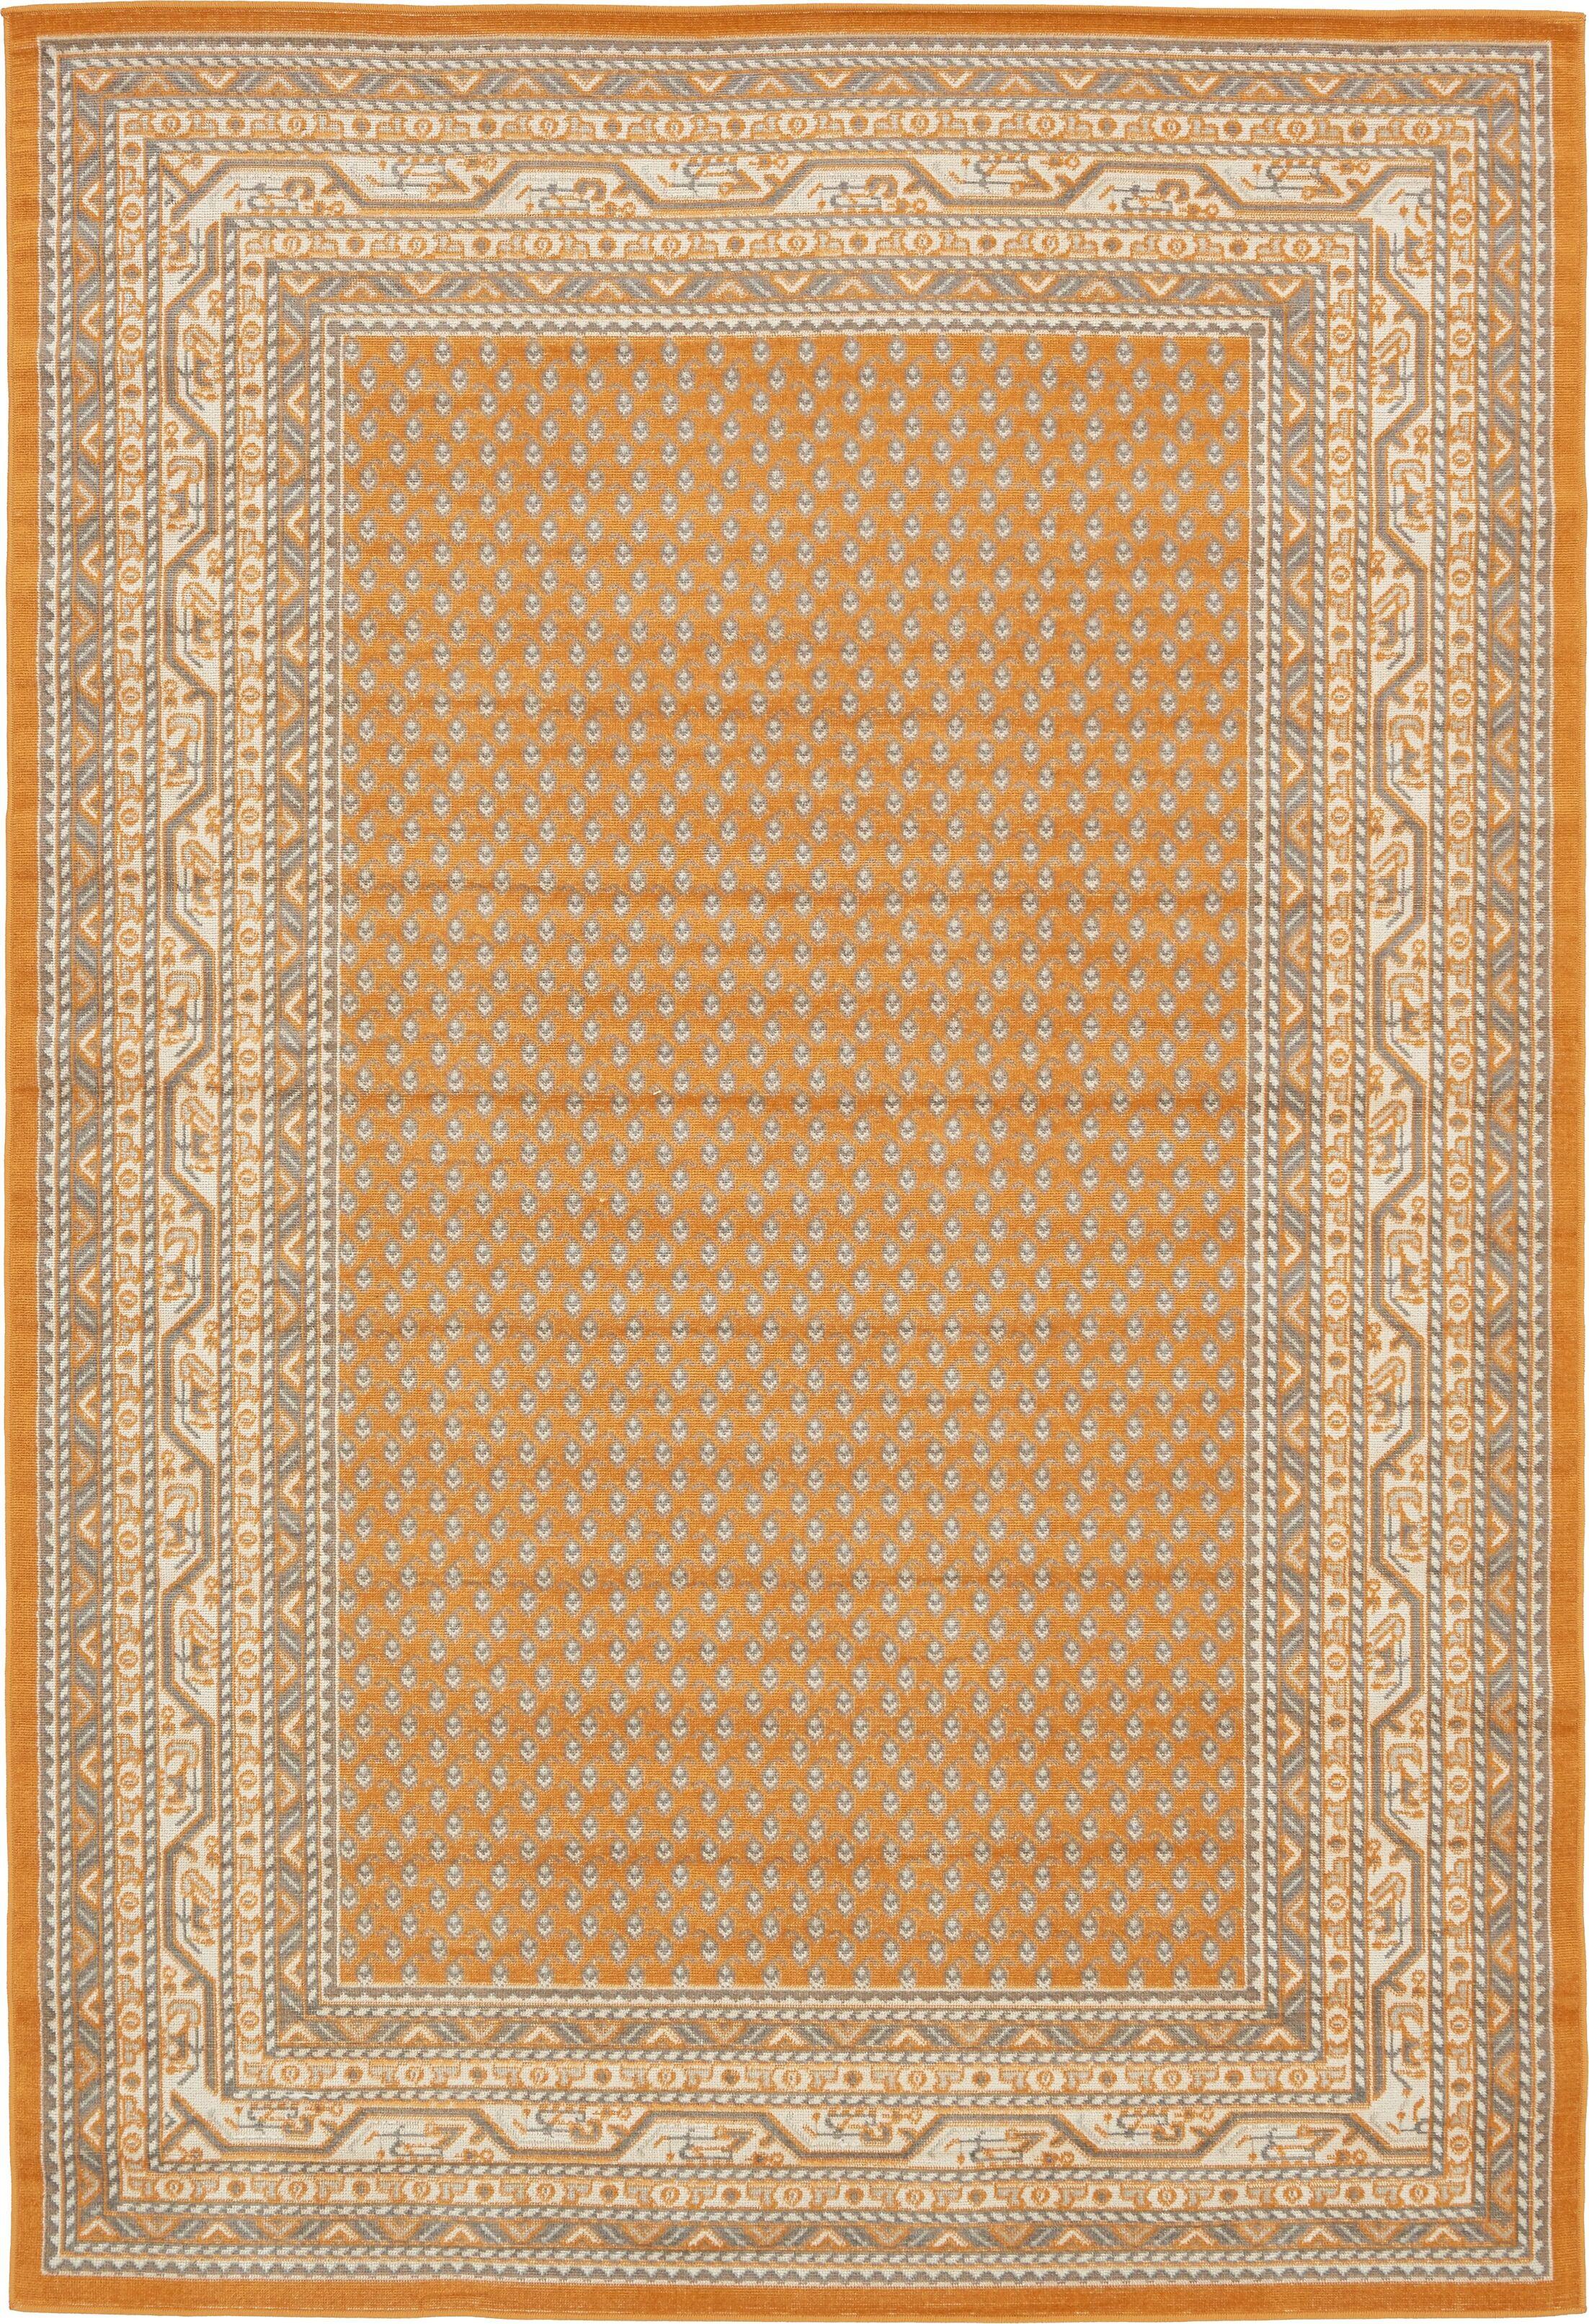 Gillam Orange Area Rug Rug Size: Rectangle 6' x 9'